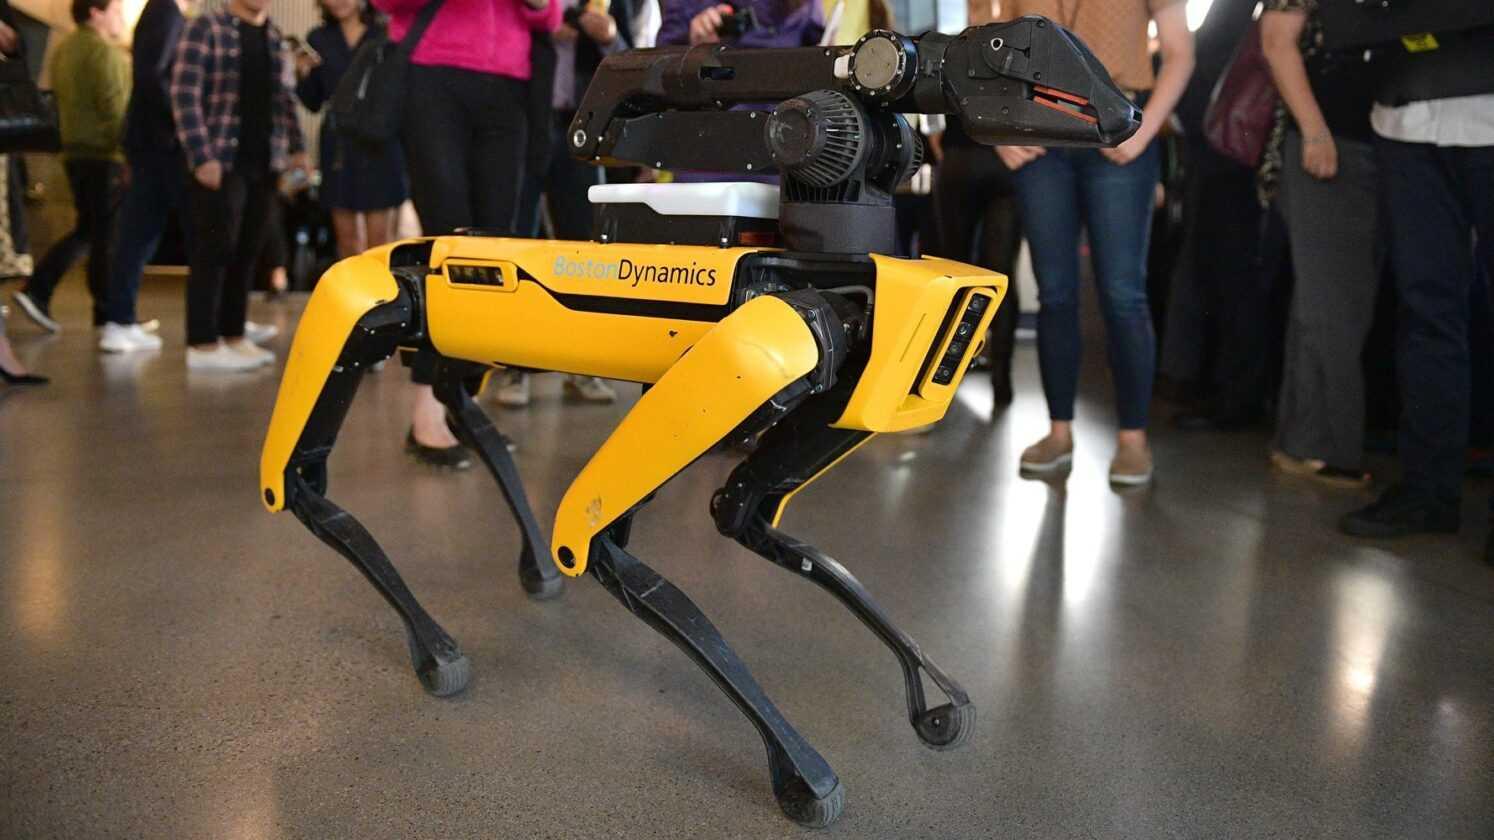 Hyundai Achète Le Fabricant De Robots Boston Dynamics